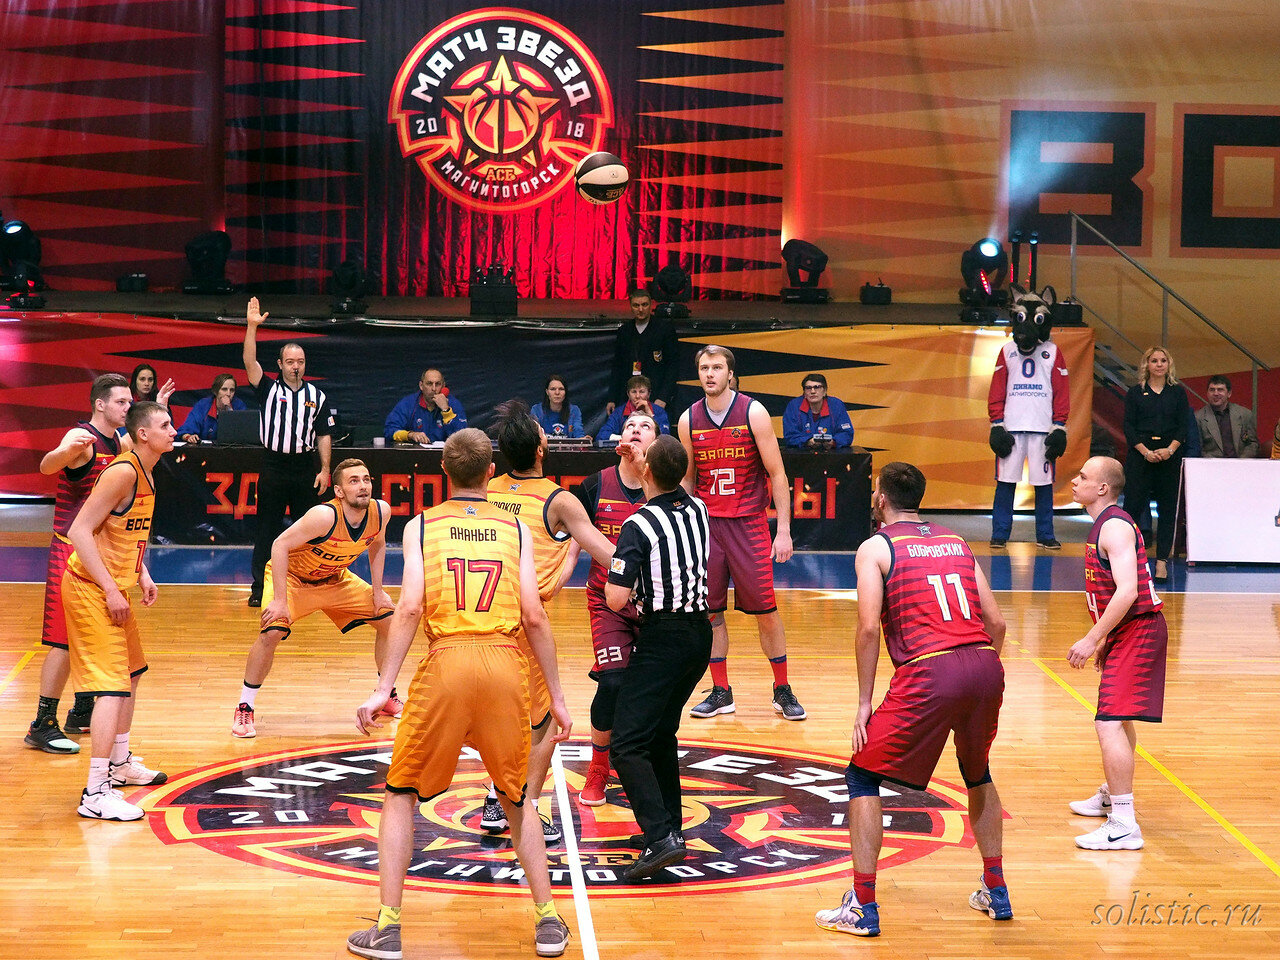 57 Матч звезд АСБ 2018 (ассоциации студенческого баскетбола)